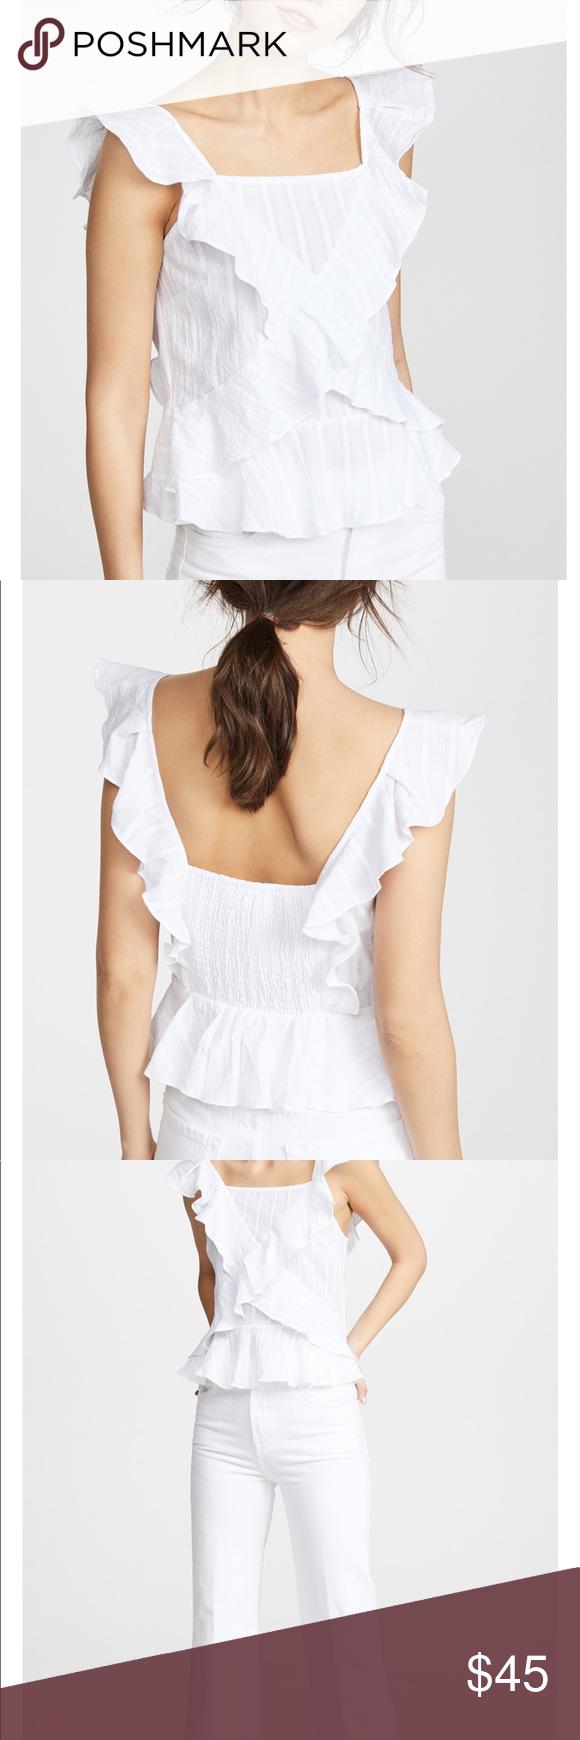 b2f1b3eb907bae Moon River cross ruffle blouse Purchased via Shopbop. I needed up buying a  medium,